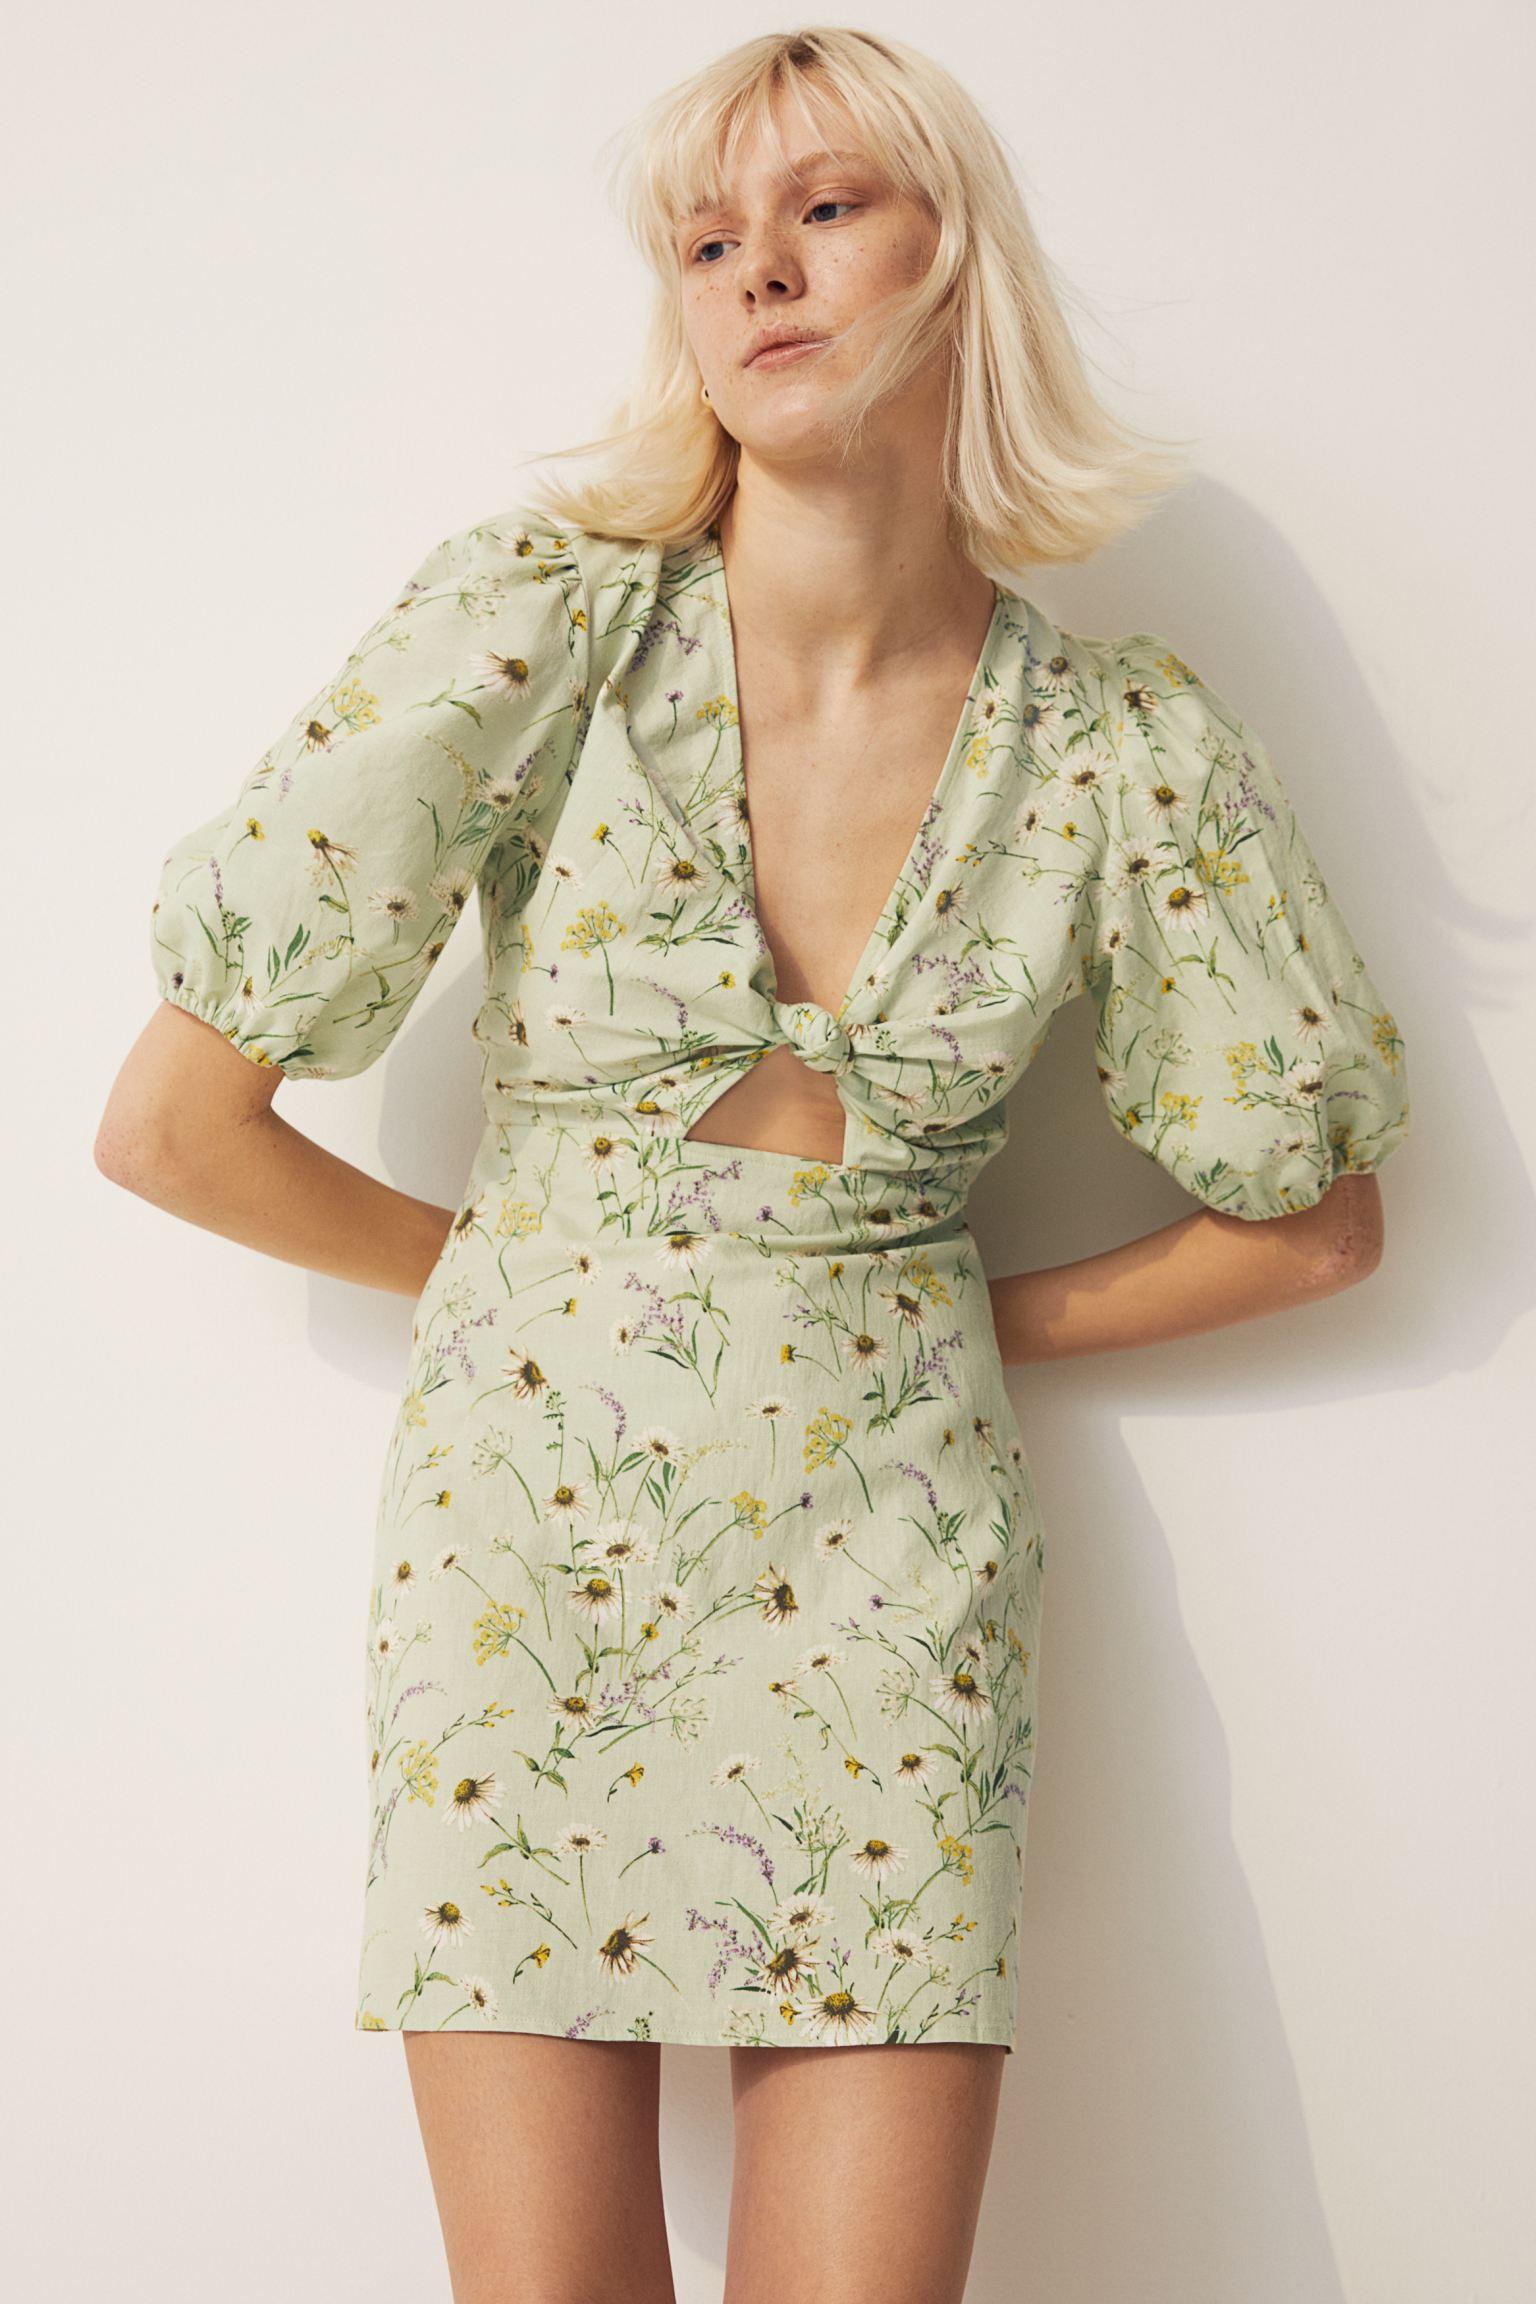 Vestido corto de lino con mangas cortas abullonadas